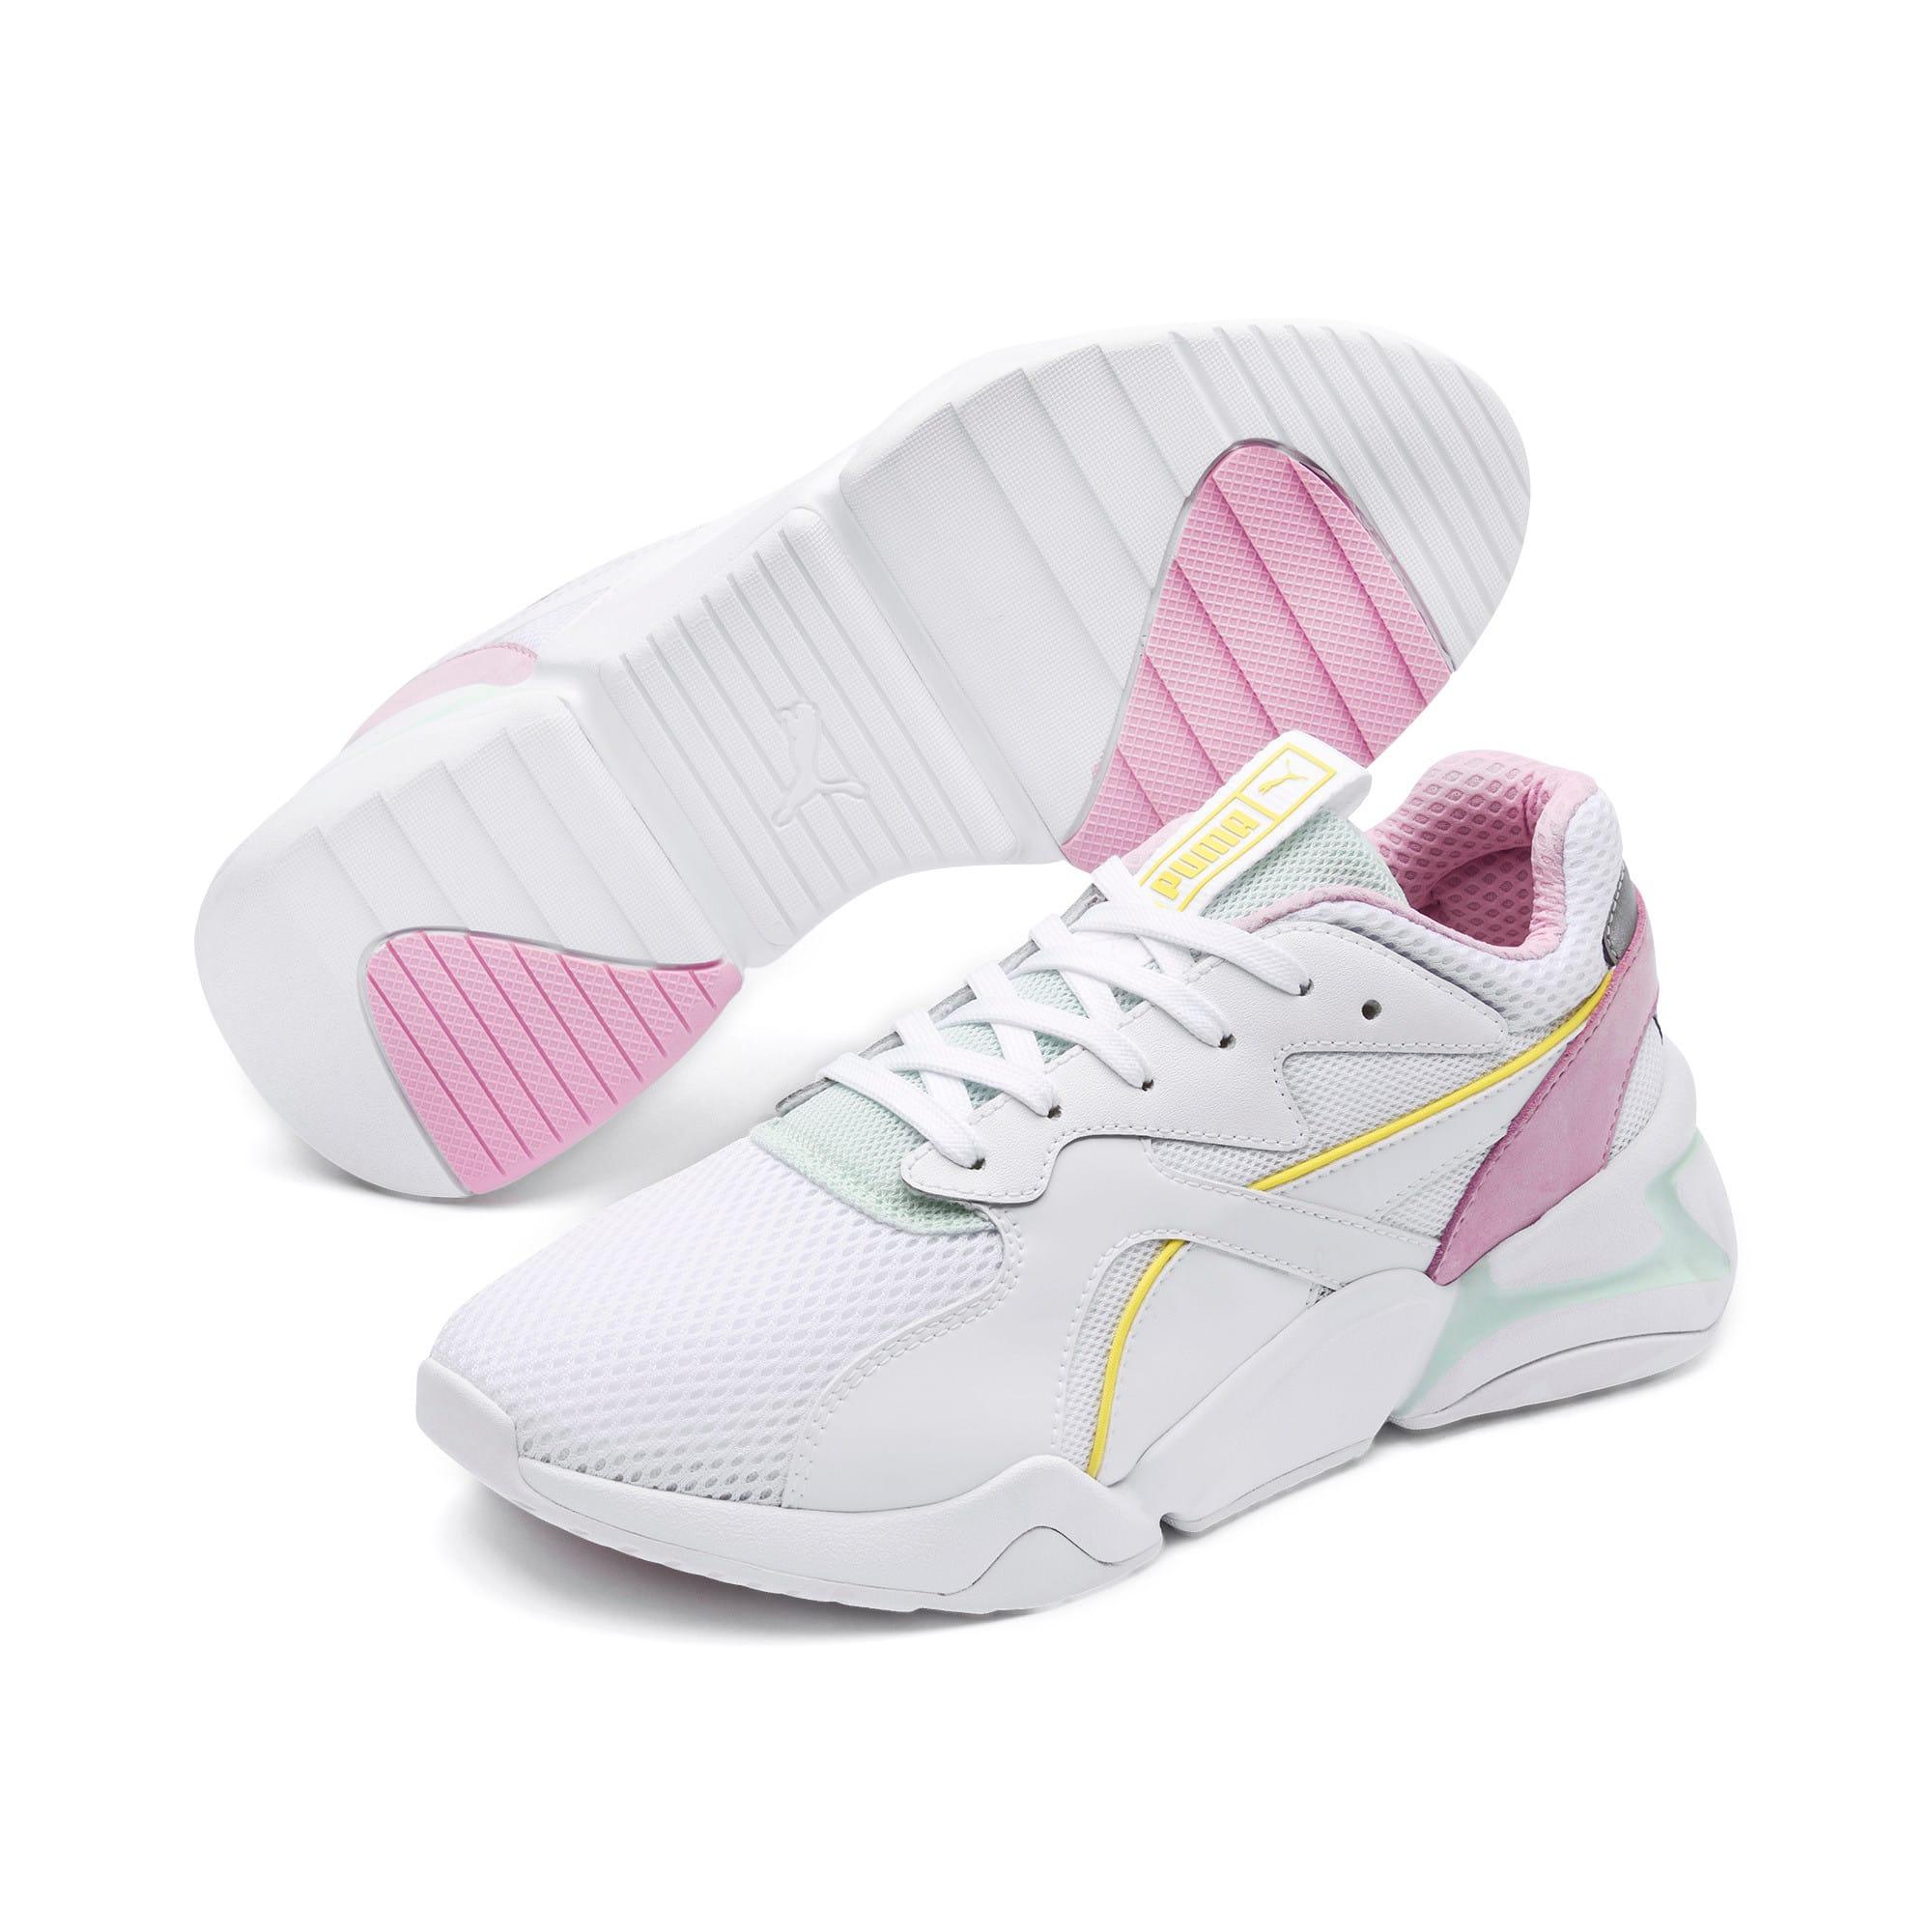 Thumbnail 3 of Nova Mesh Women's Sneakers, Puma White-Fair Aqua, medium